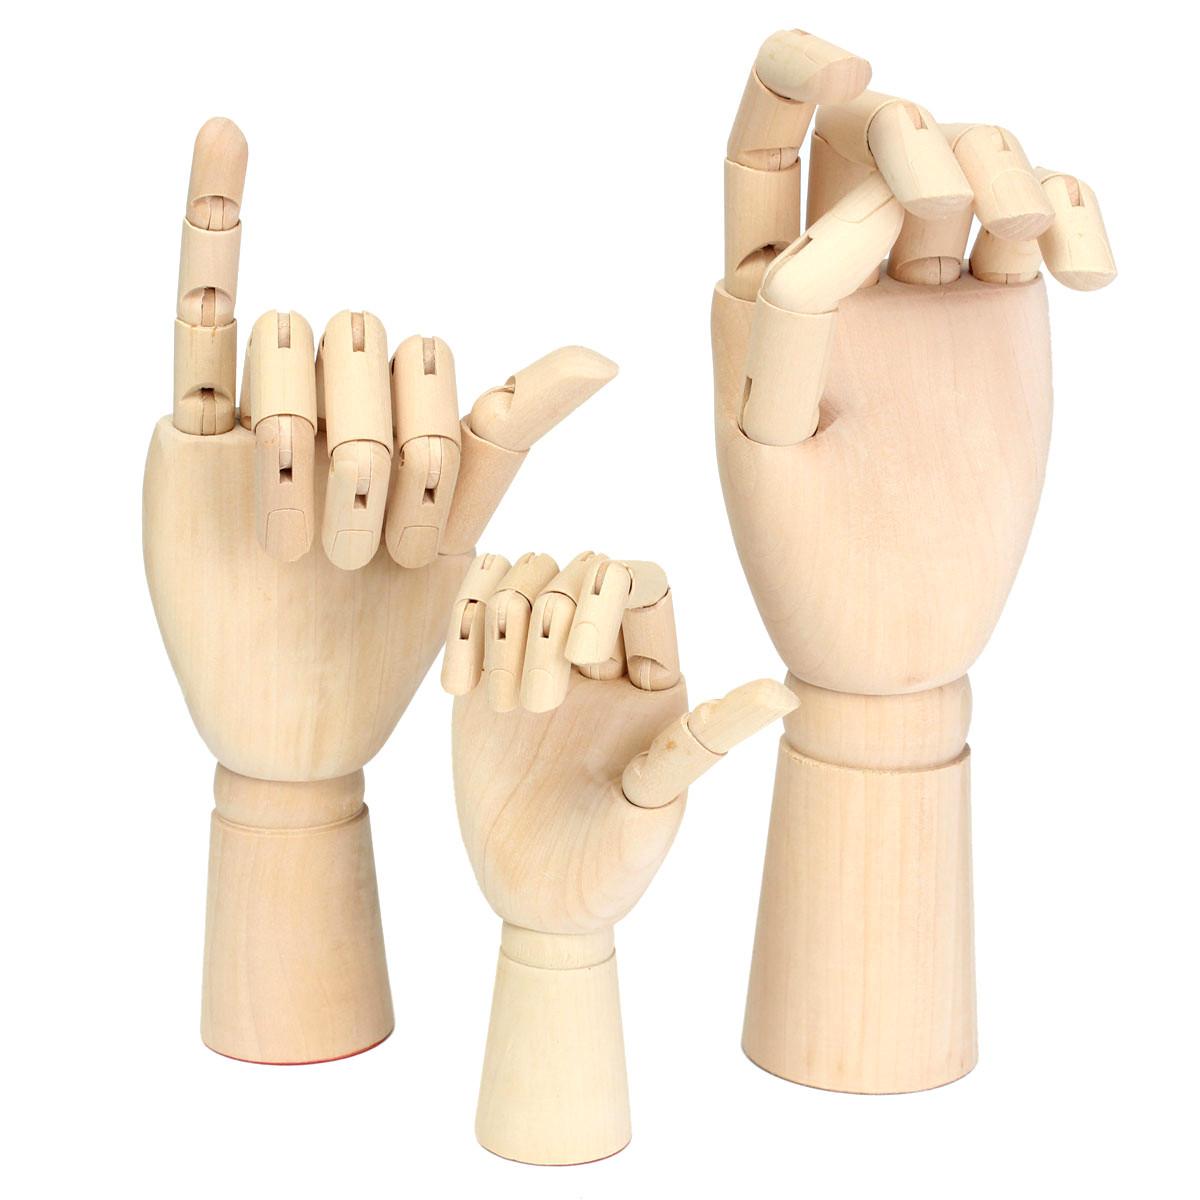 Wooden Artist Articulated Right Hand Art Model SKETCH Flexible Decoration